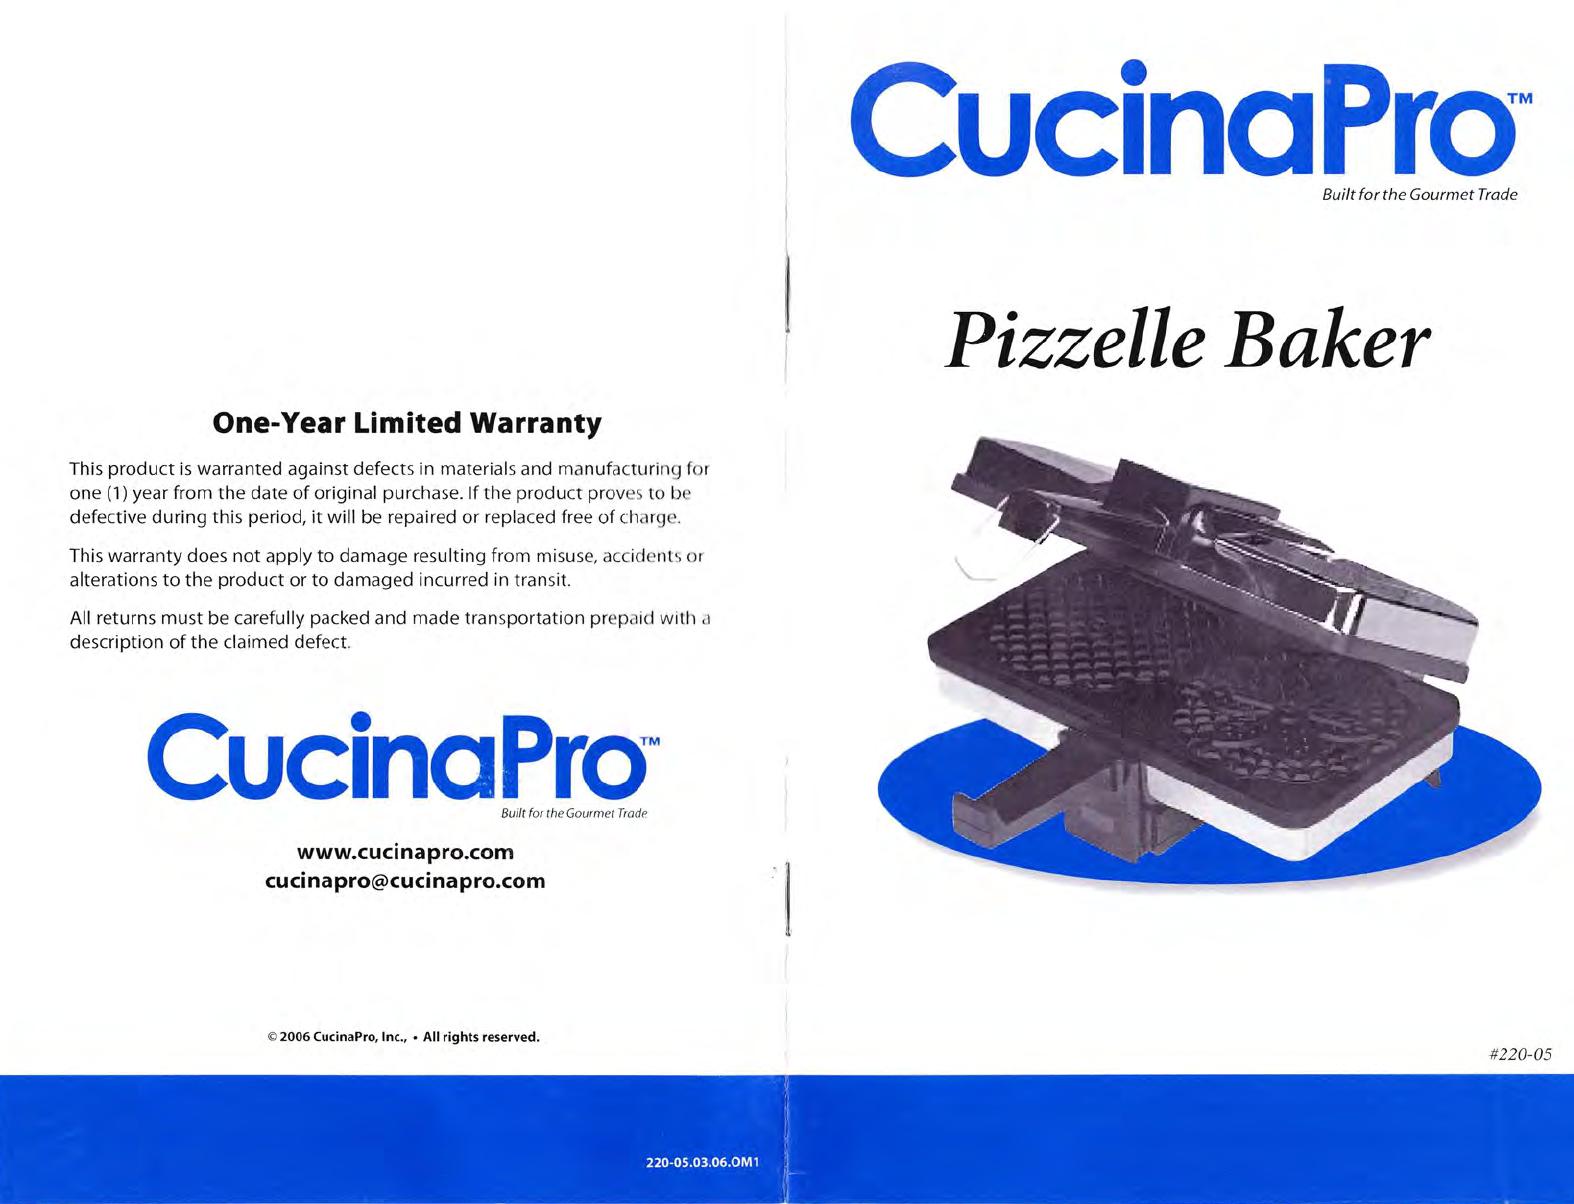 Cucinapro Pizzelle Baker Manual